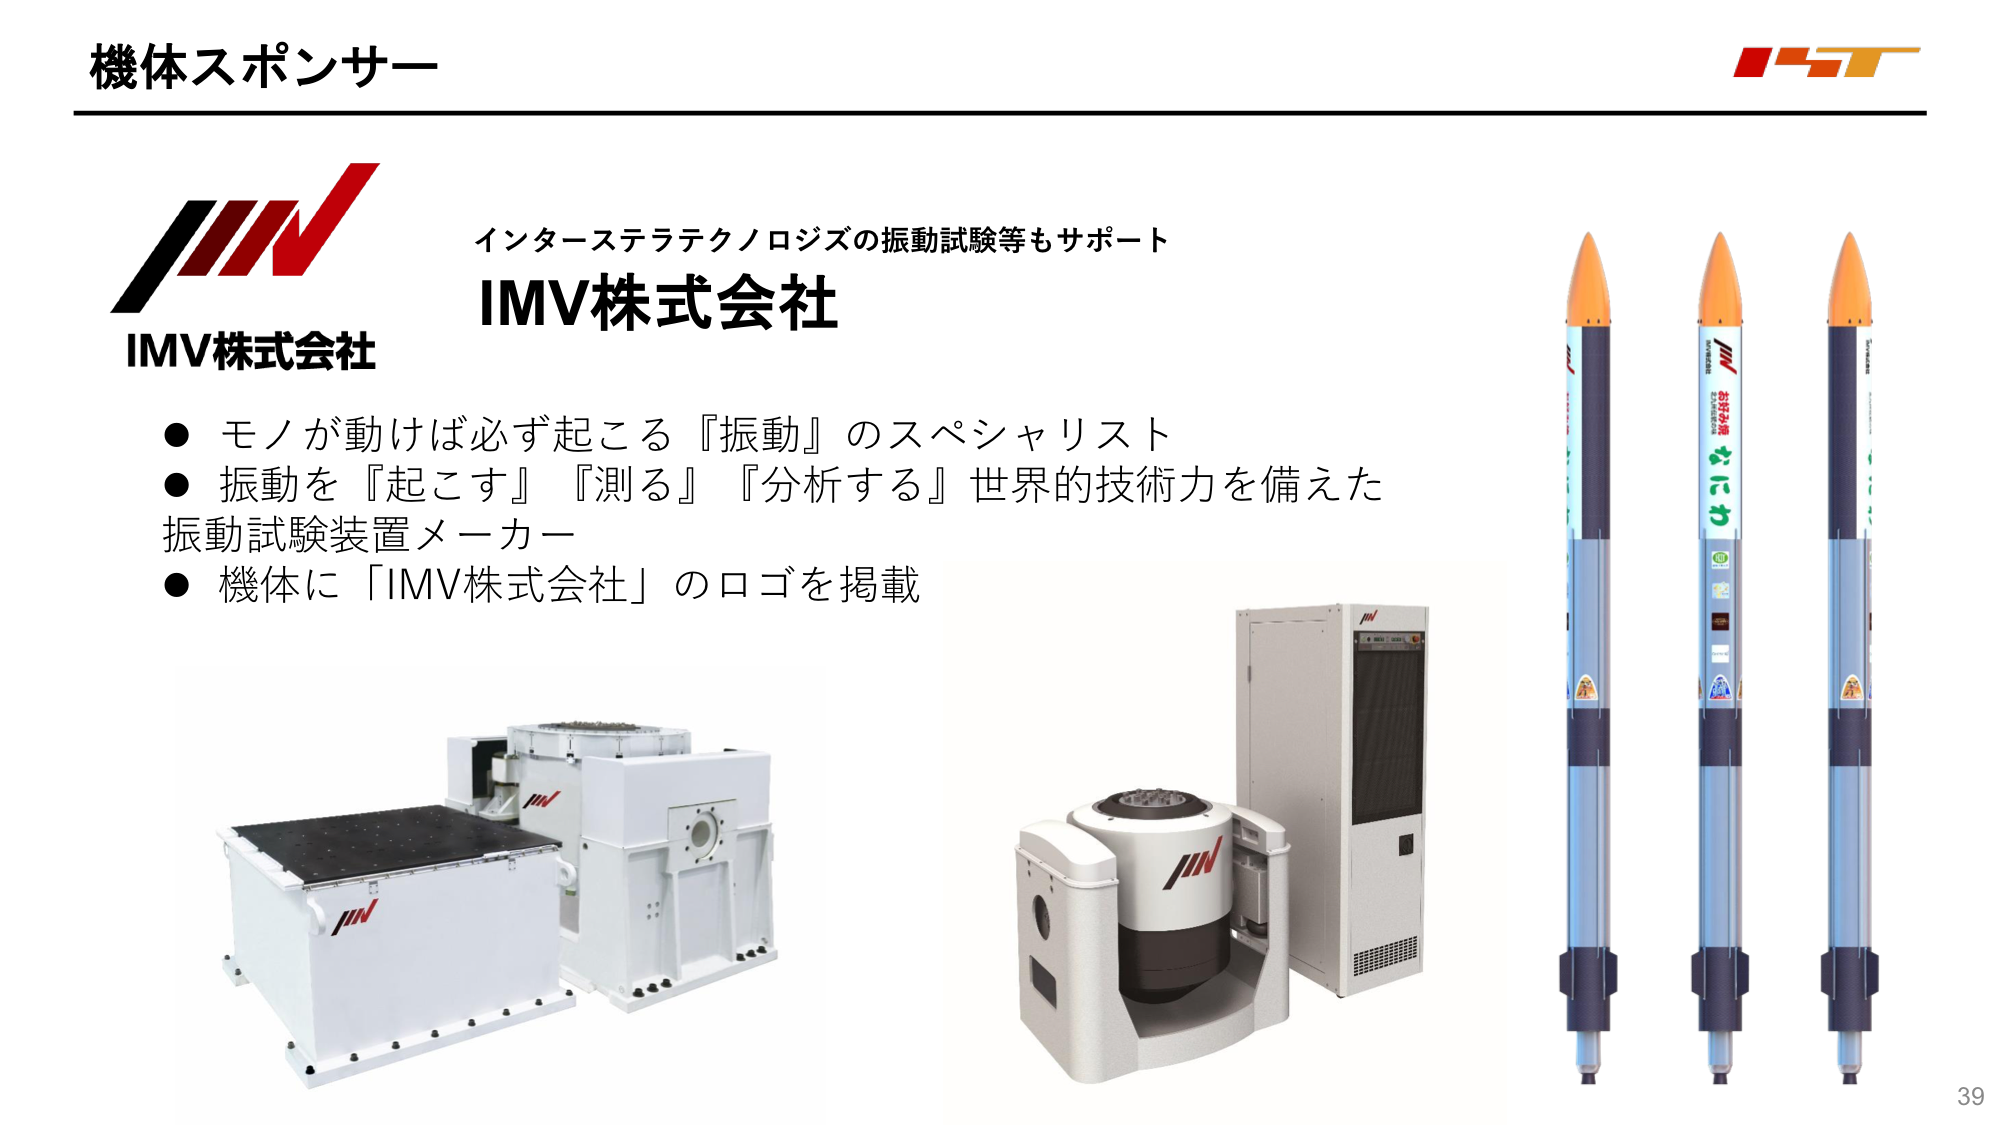 f:id:Imamura:20200603233118p:plain